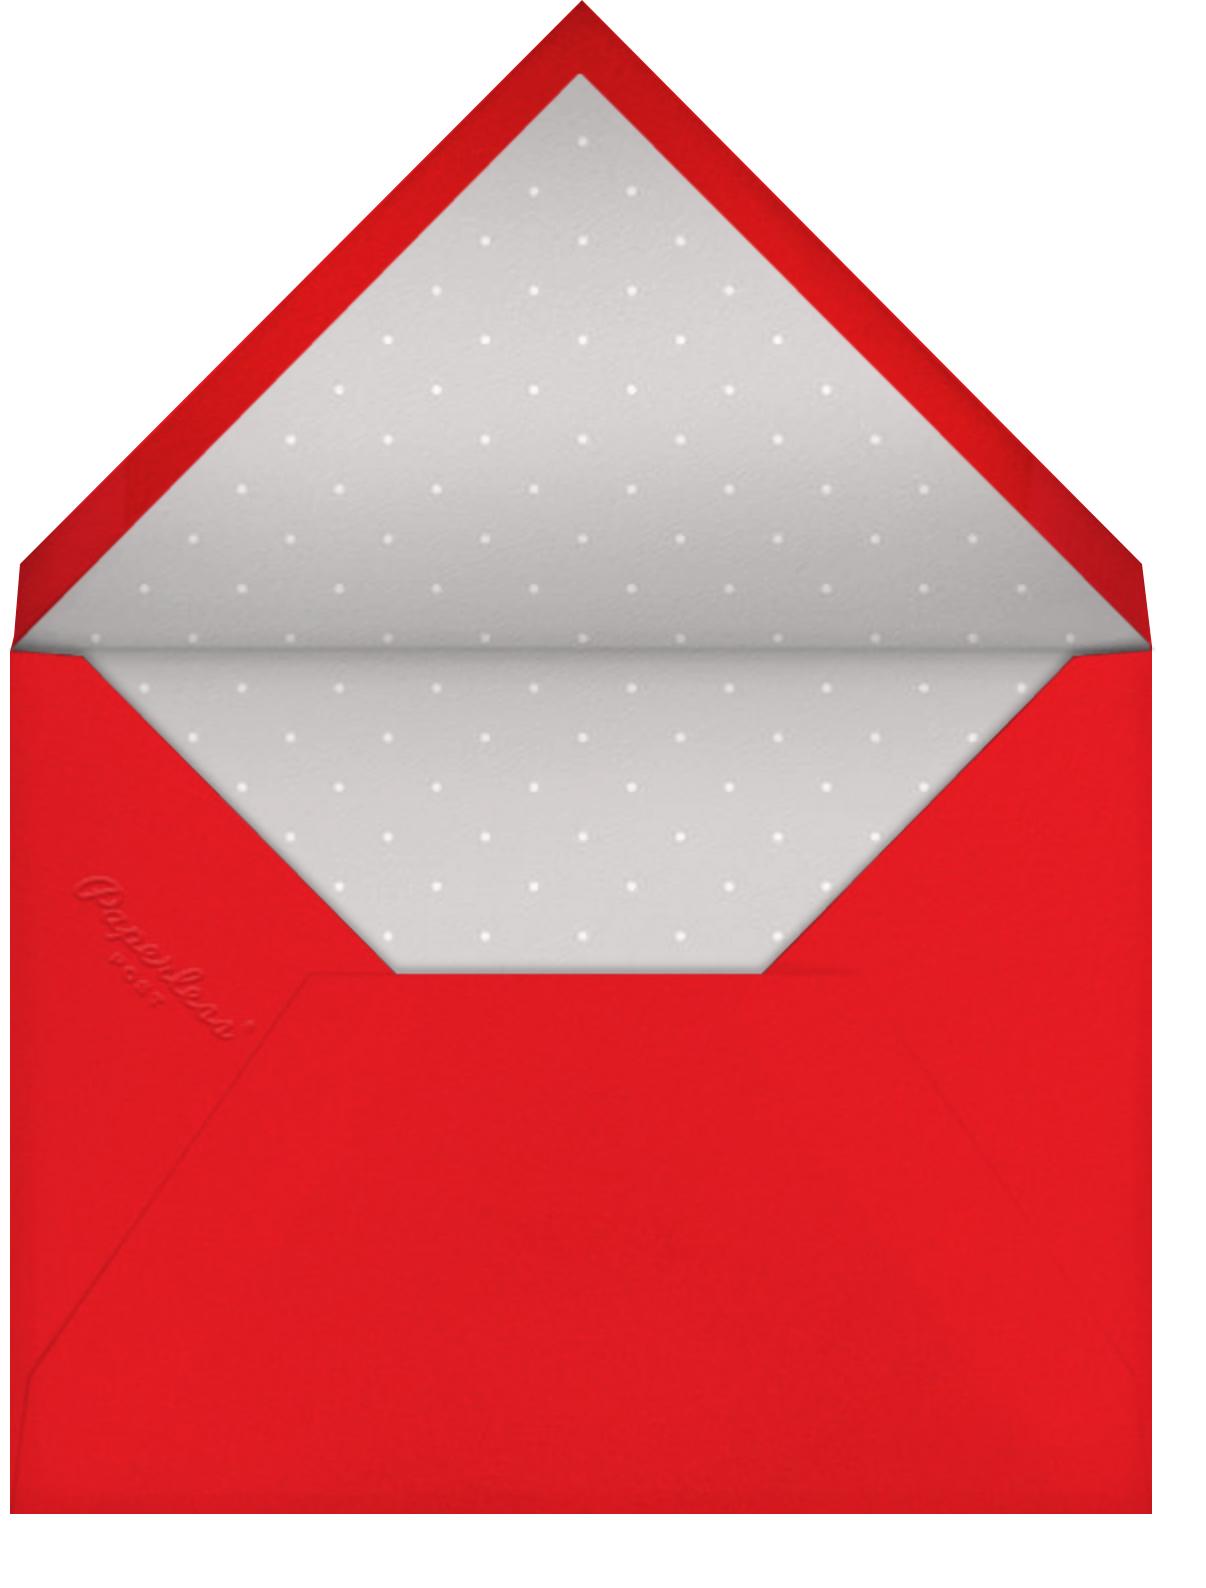 Burst Forth - Blue - Paperless Post - Envelope